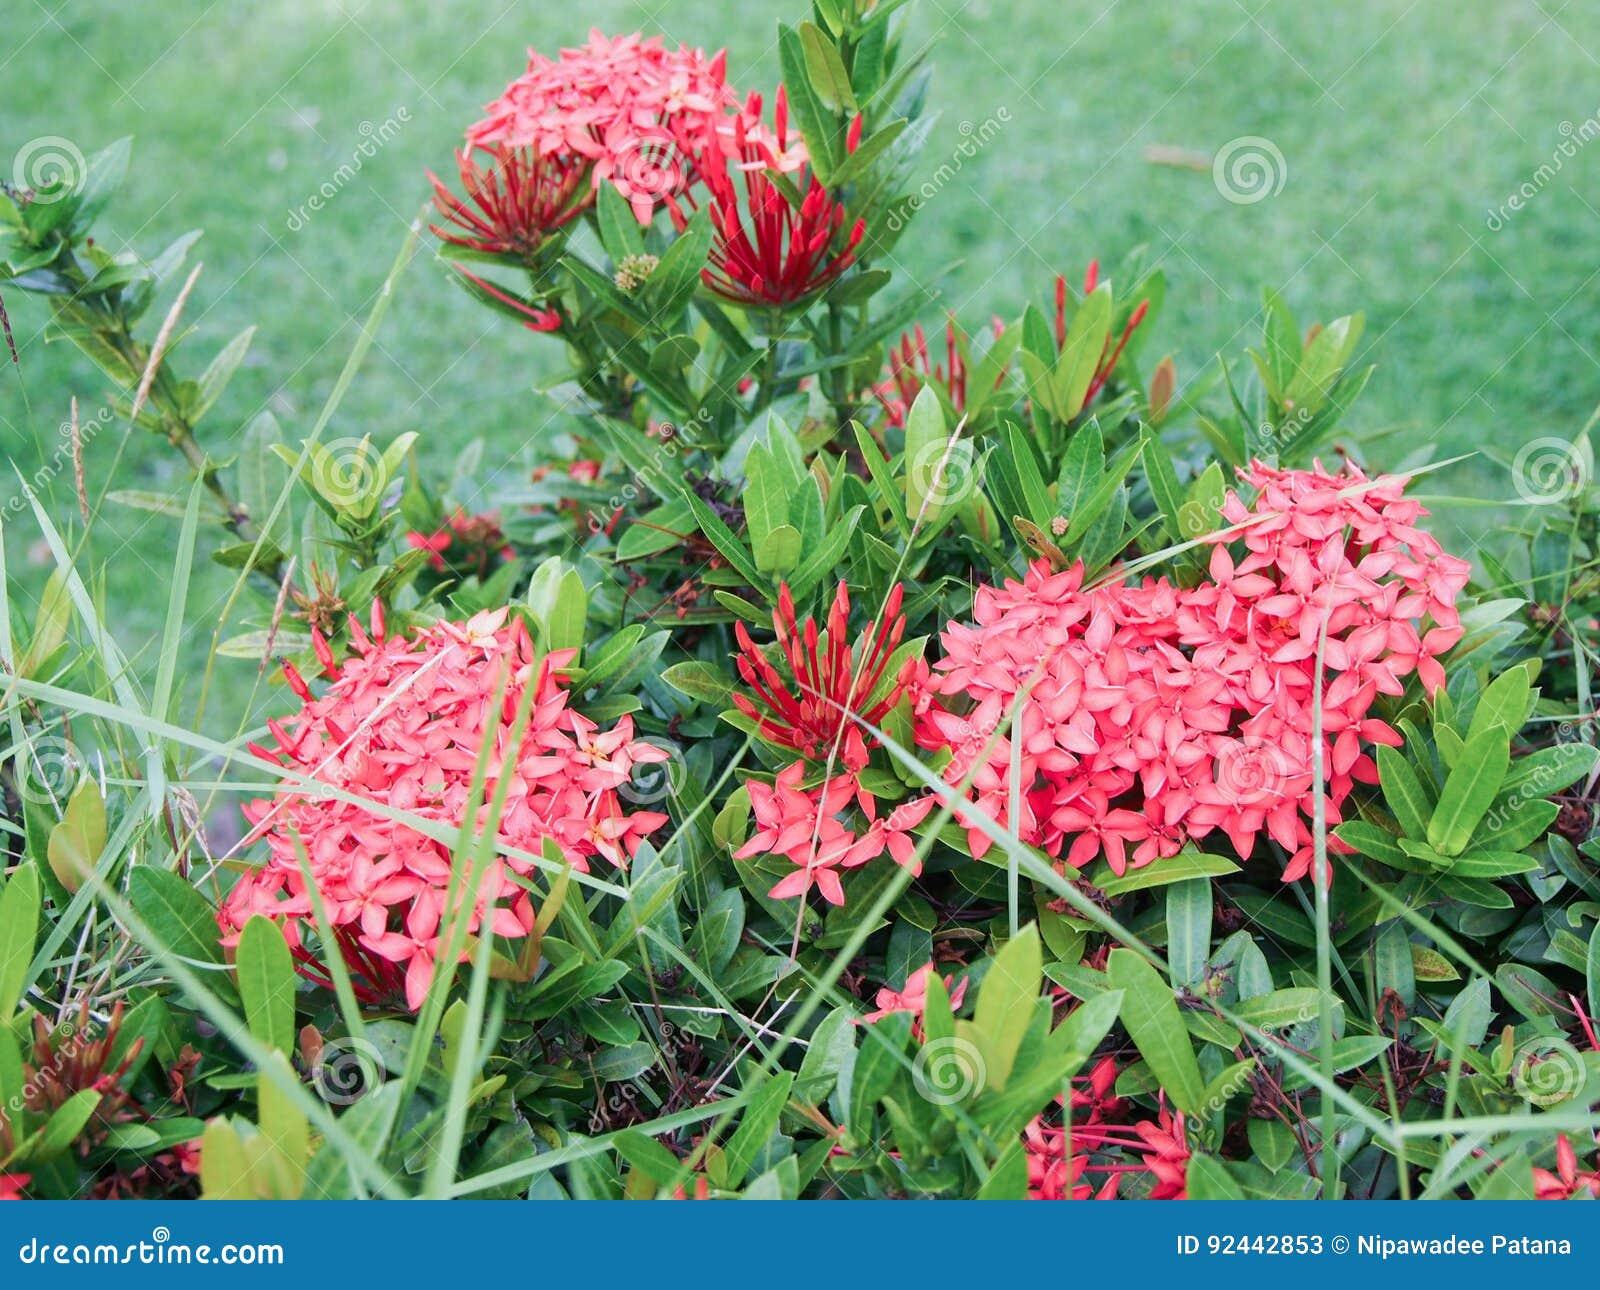 Pink Spike Flower Ixora Stock Image Image Of Background 92442853